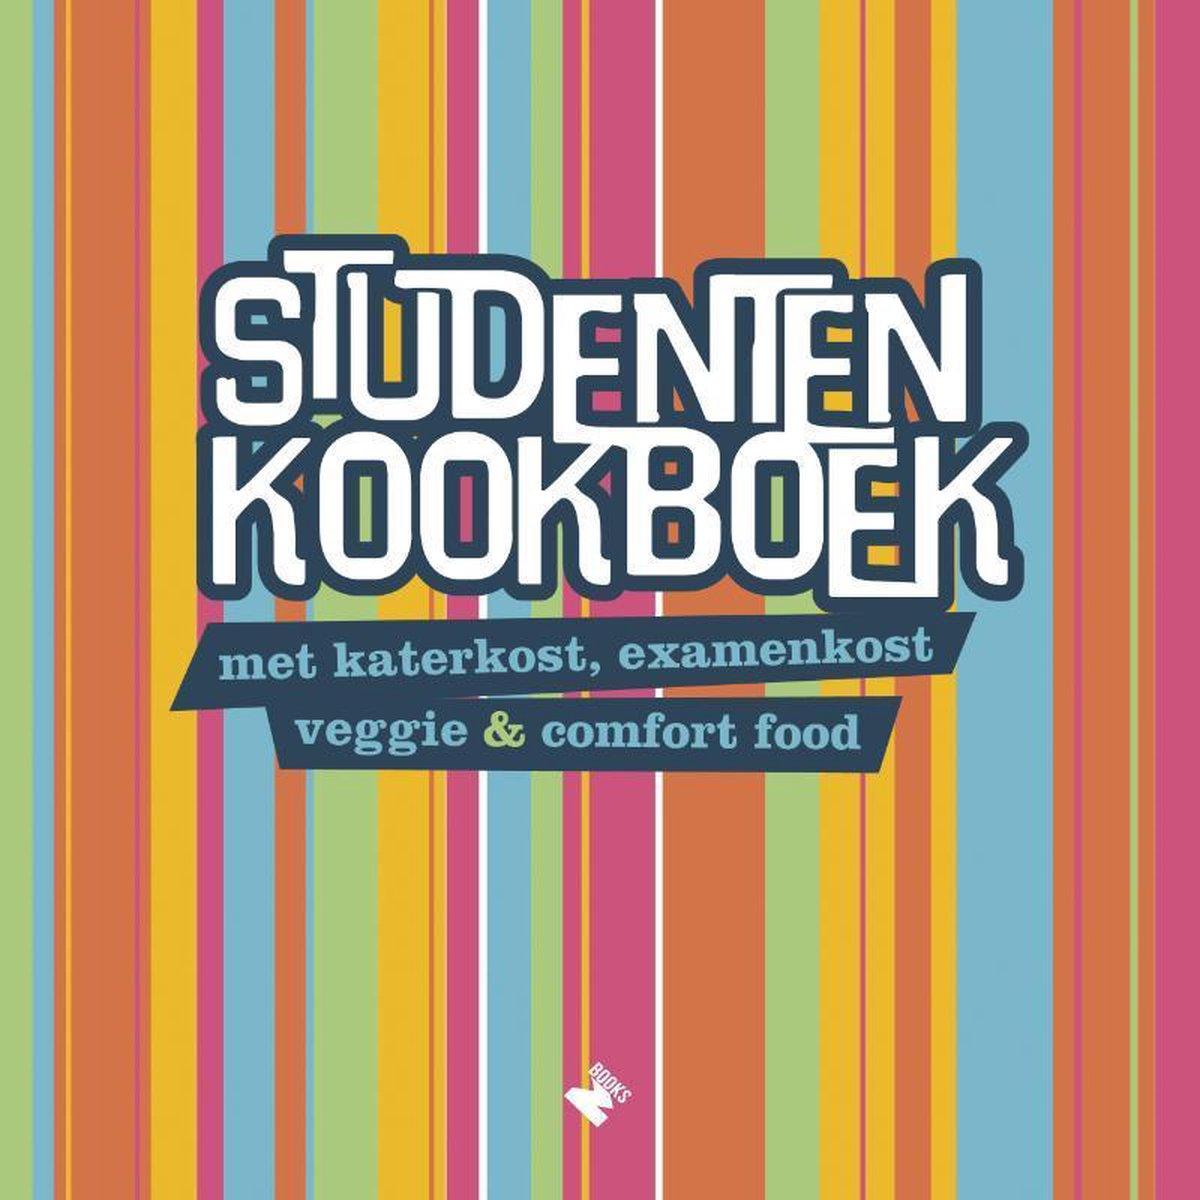 Studentenkookboek - Standaard Uitgeverij